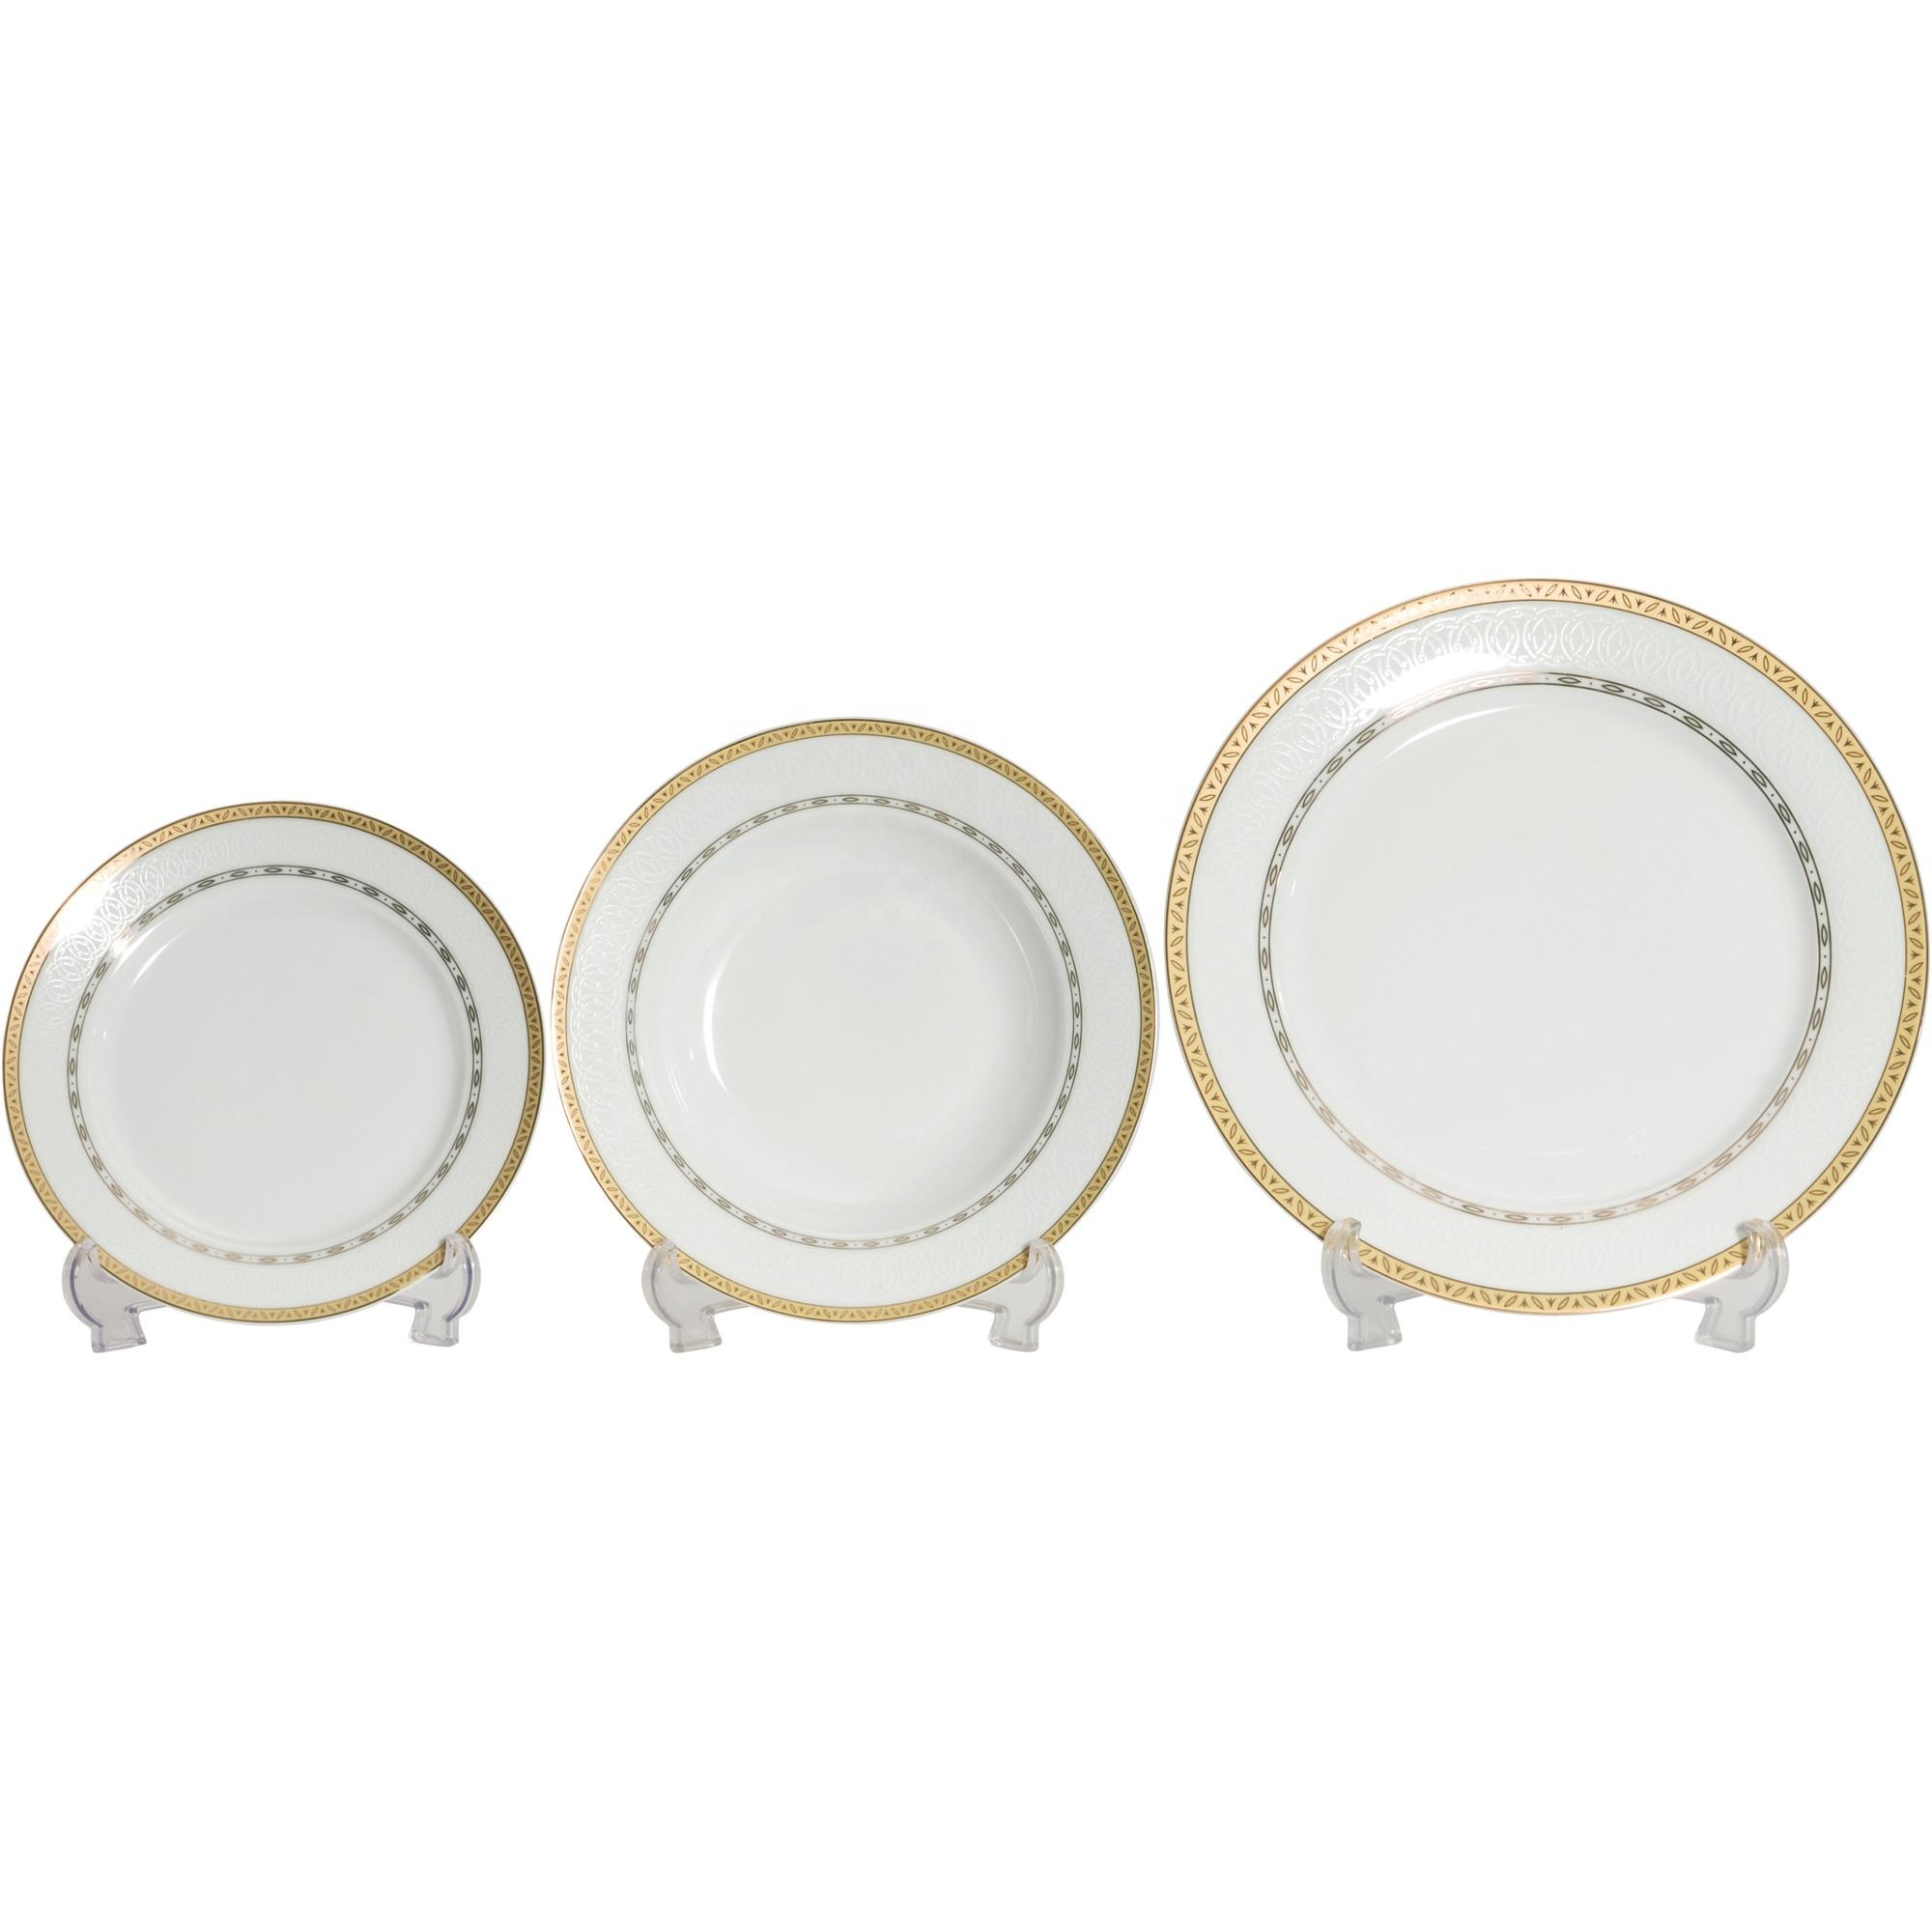 Hotel,Restaurant Home Round Plate Porcelain,Ceramic Dinnerware